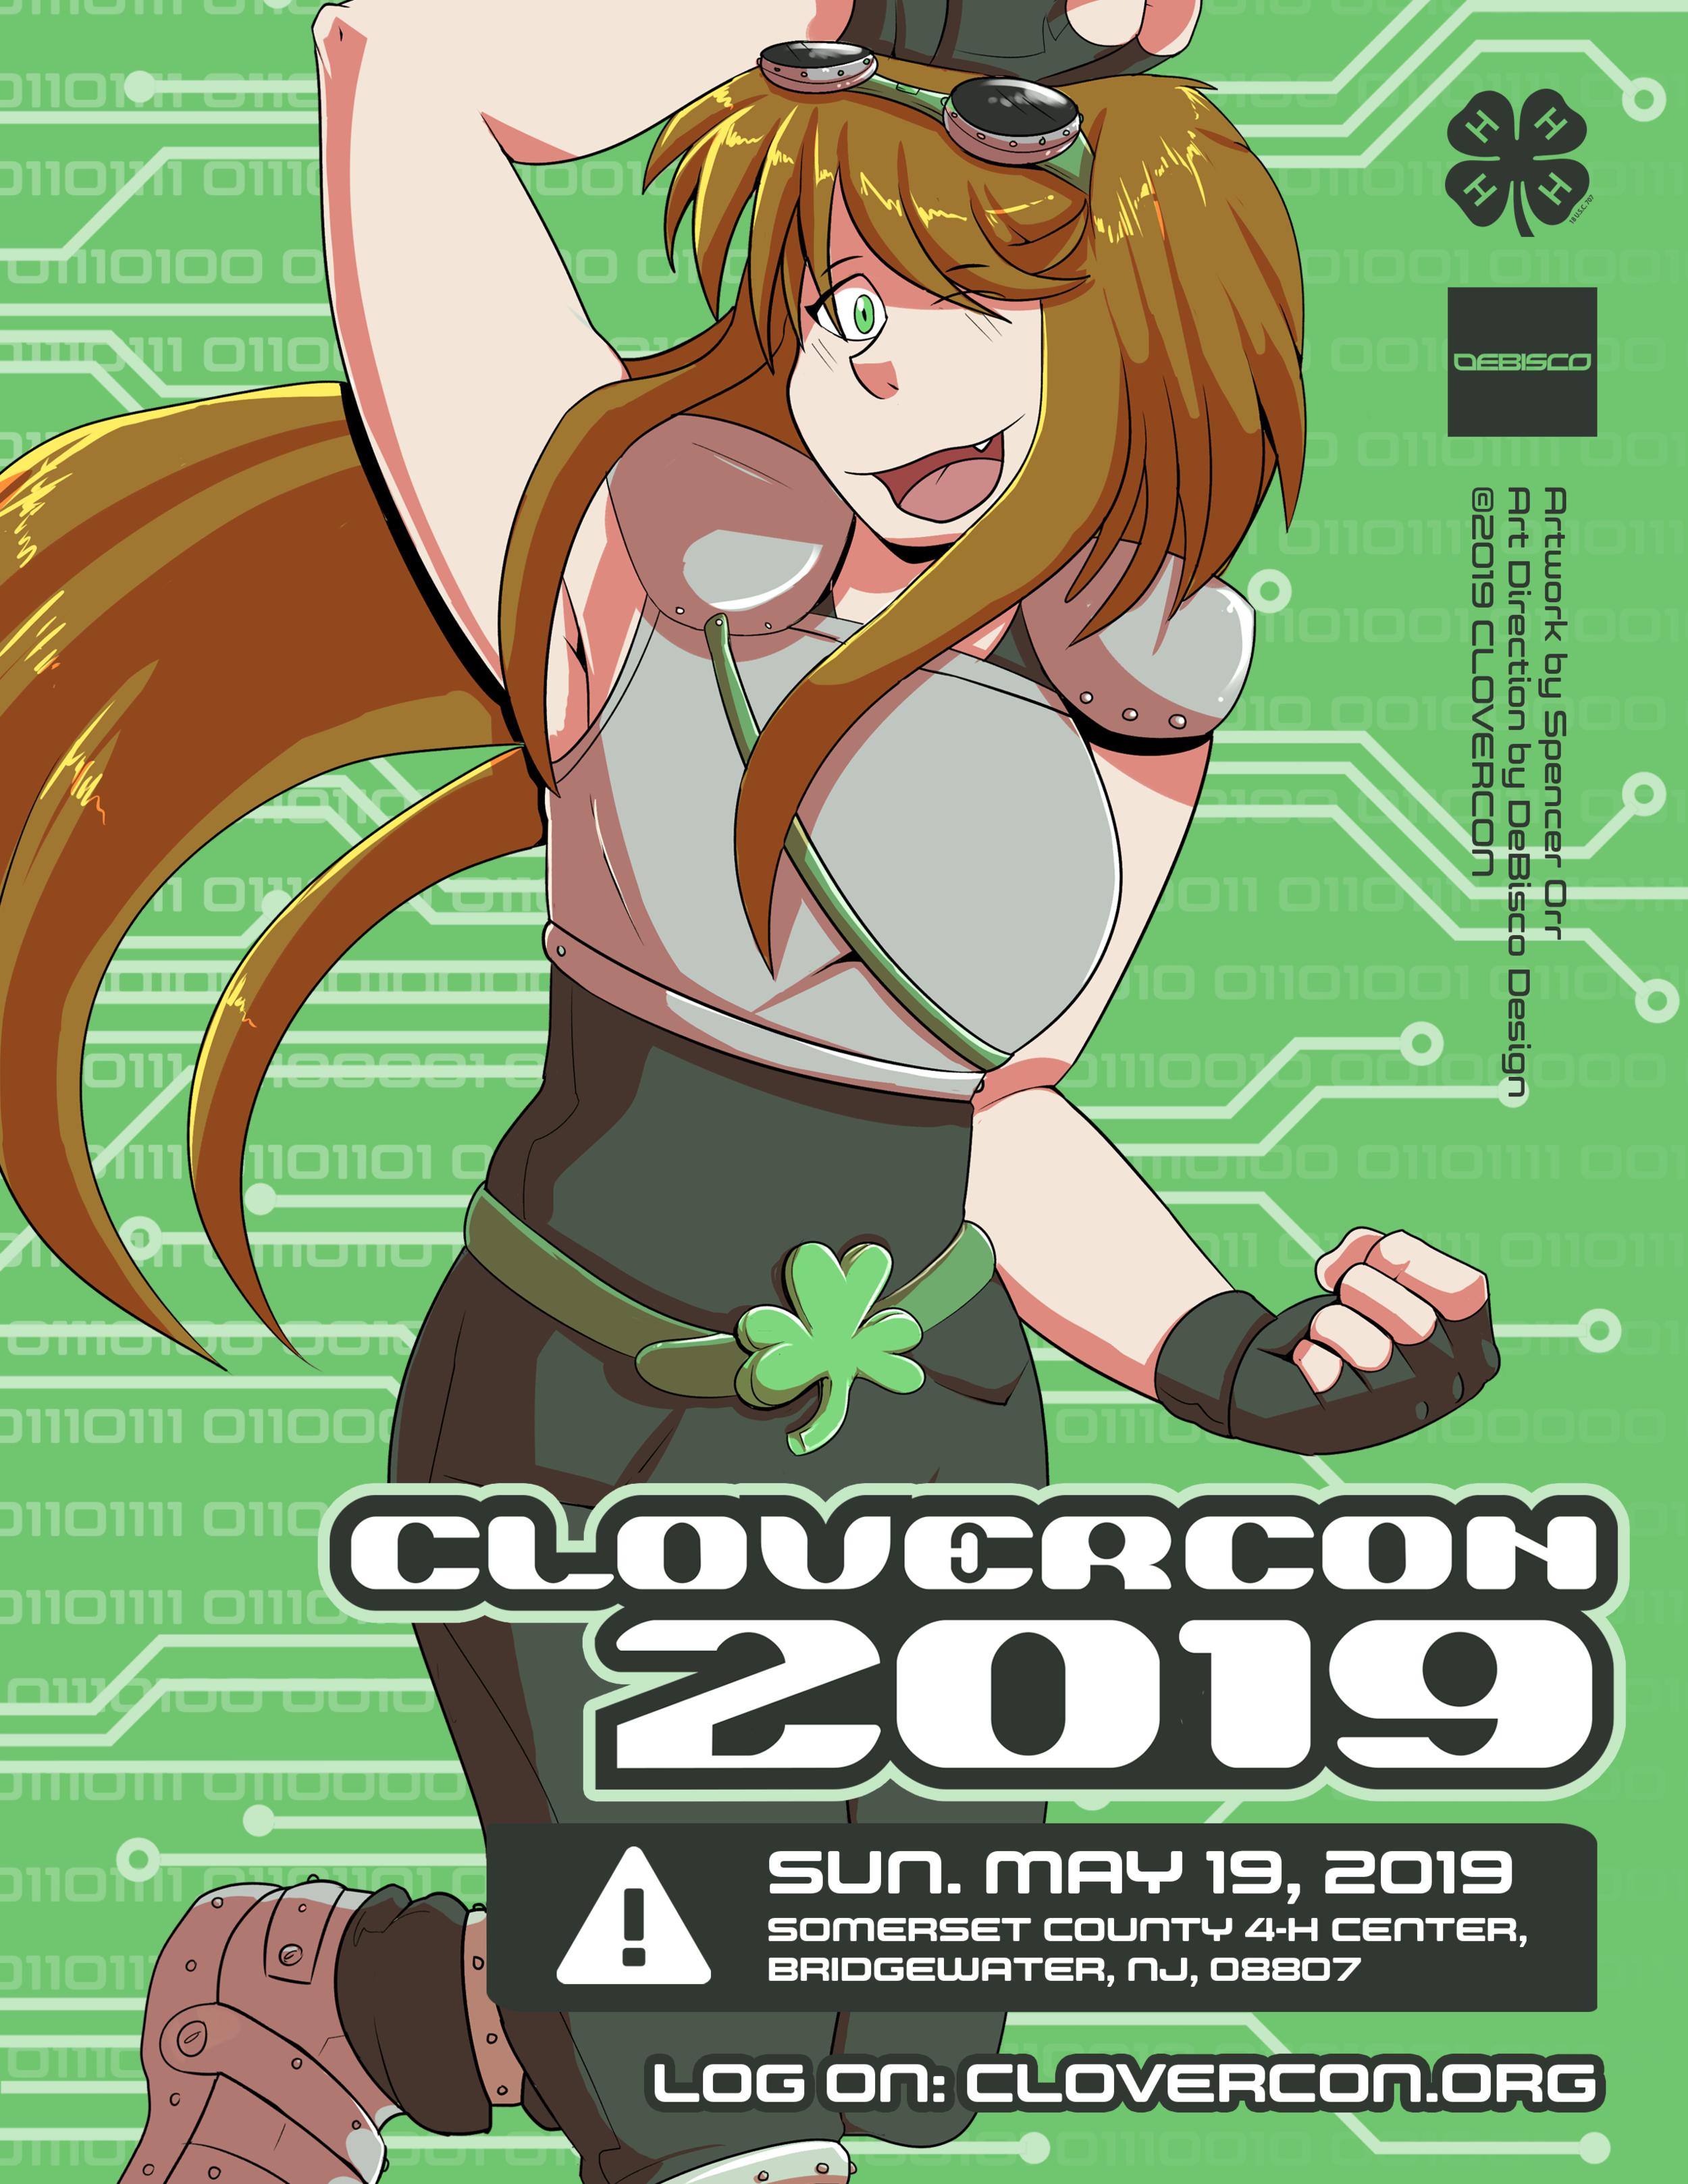 clovercon_2019_flyer_FINAL.png